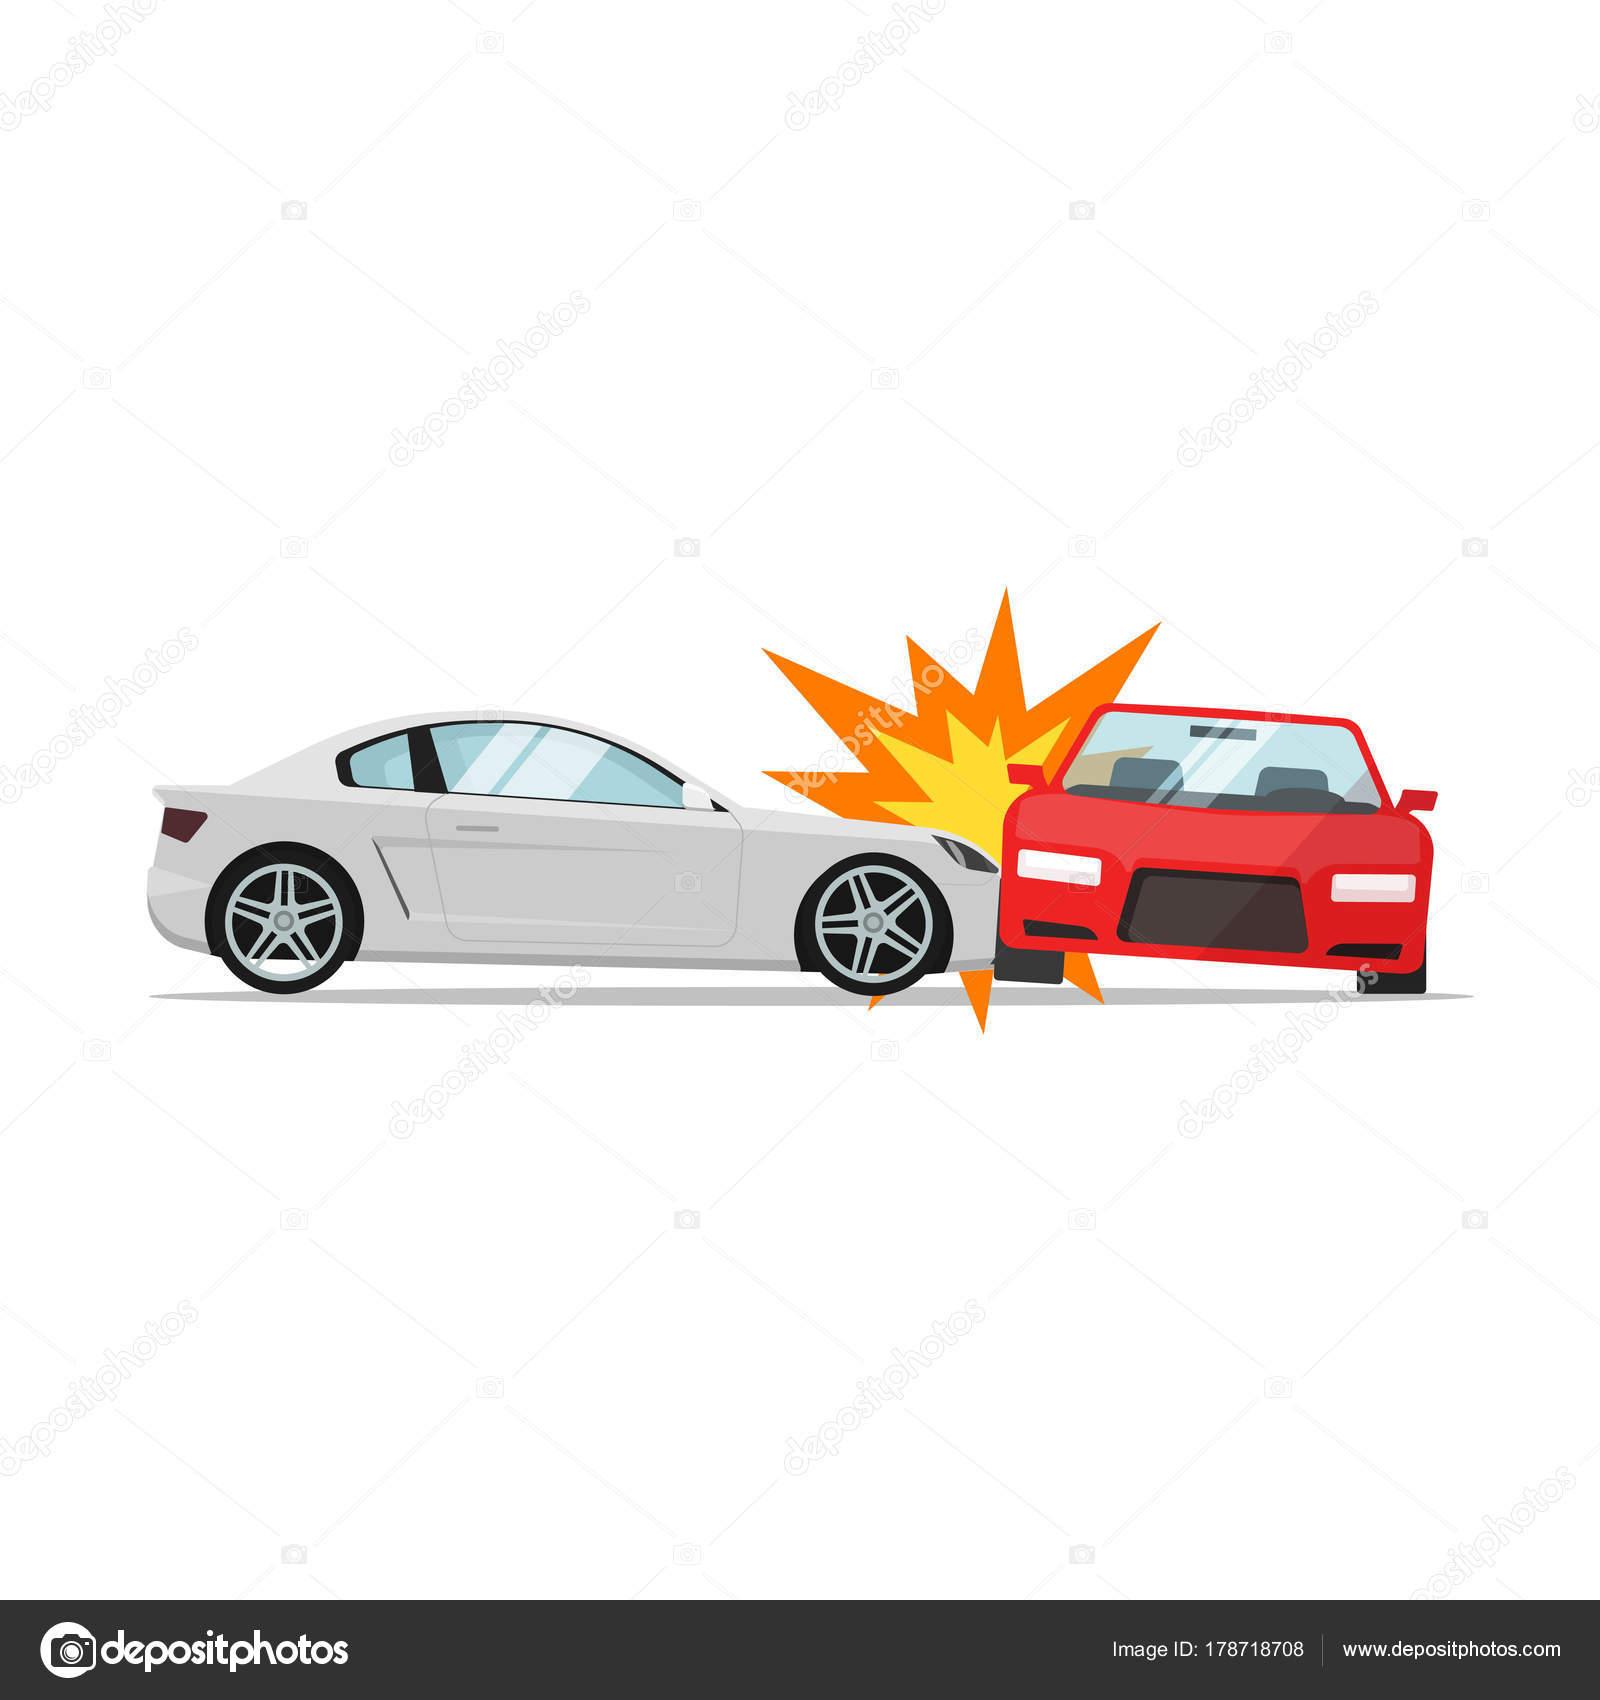 Auto-Crash-Vektor, Kollision von zwei Autos, Auto-Unfall-Szene ...